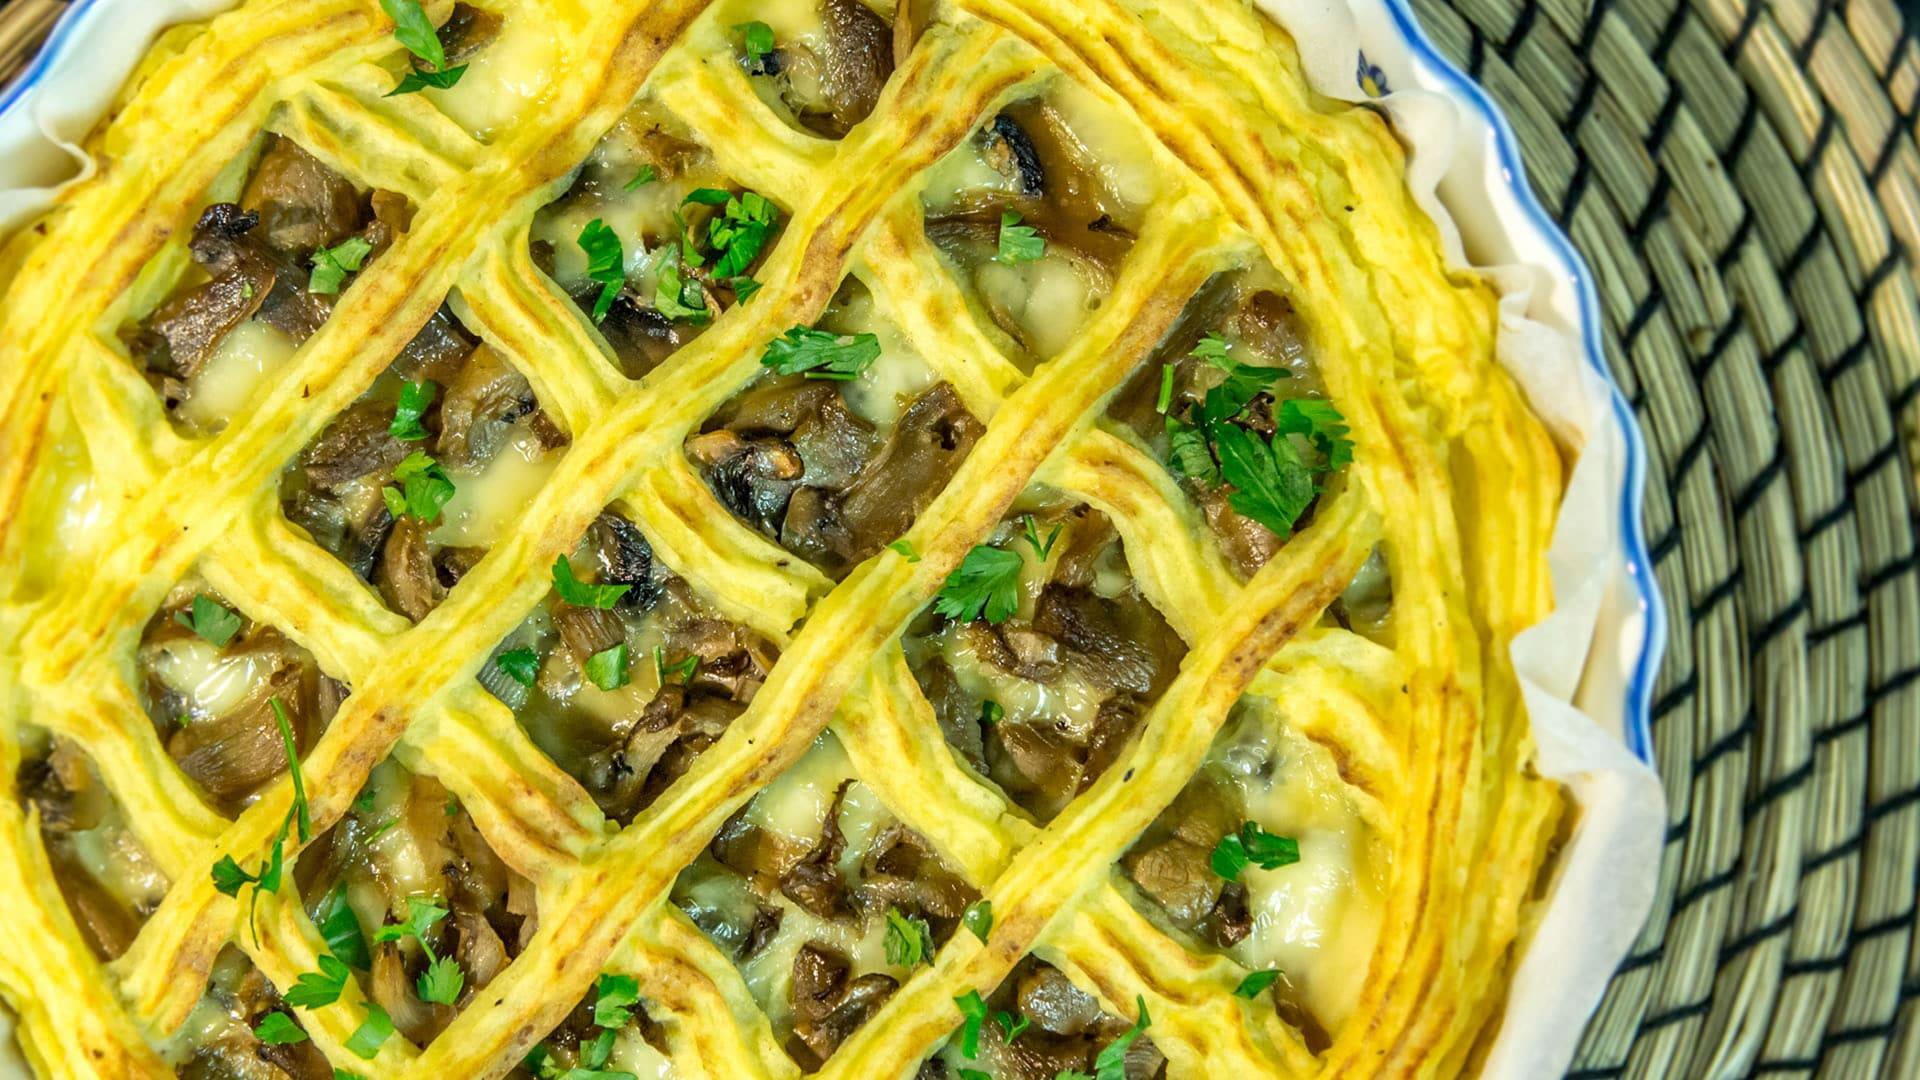 Crostata Di Patate E Funghi Senza Glutine